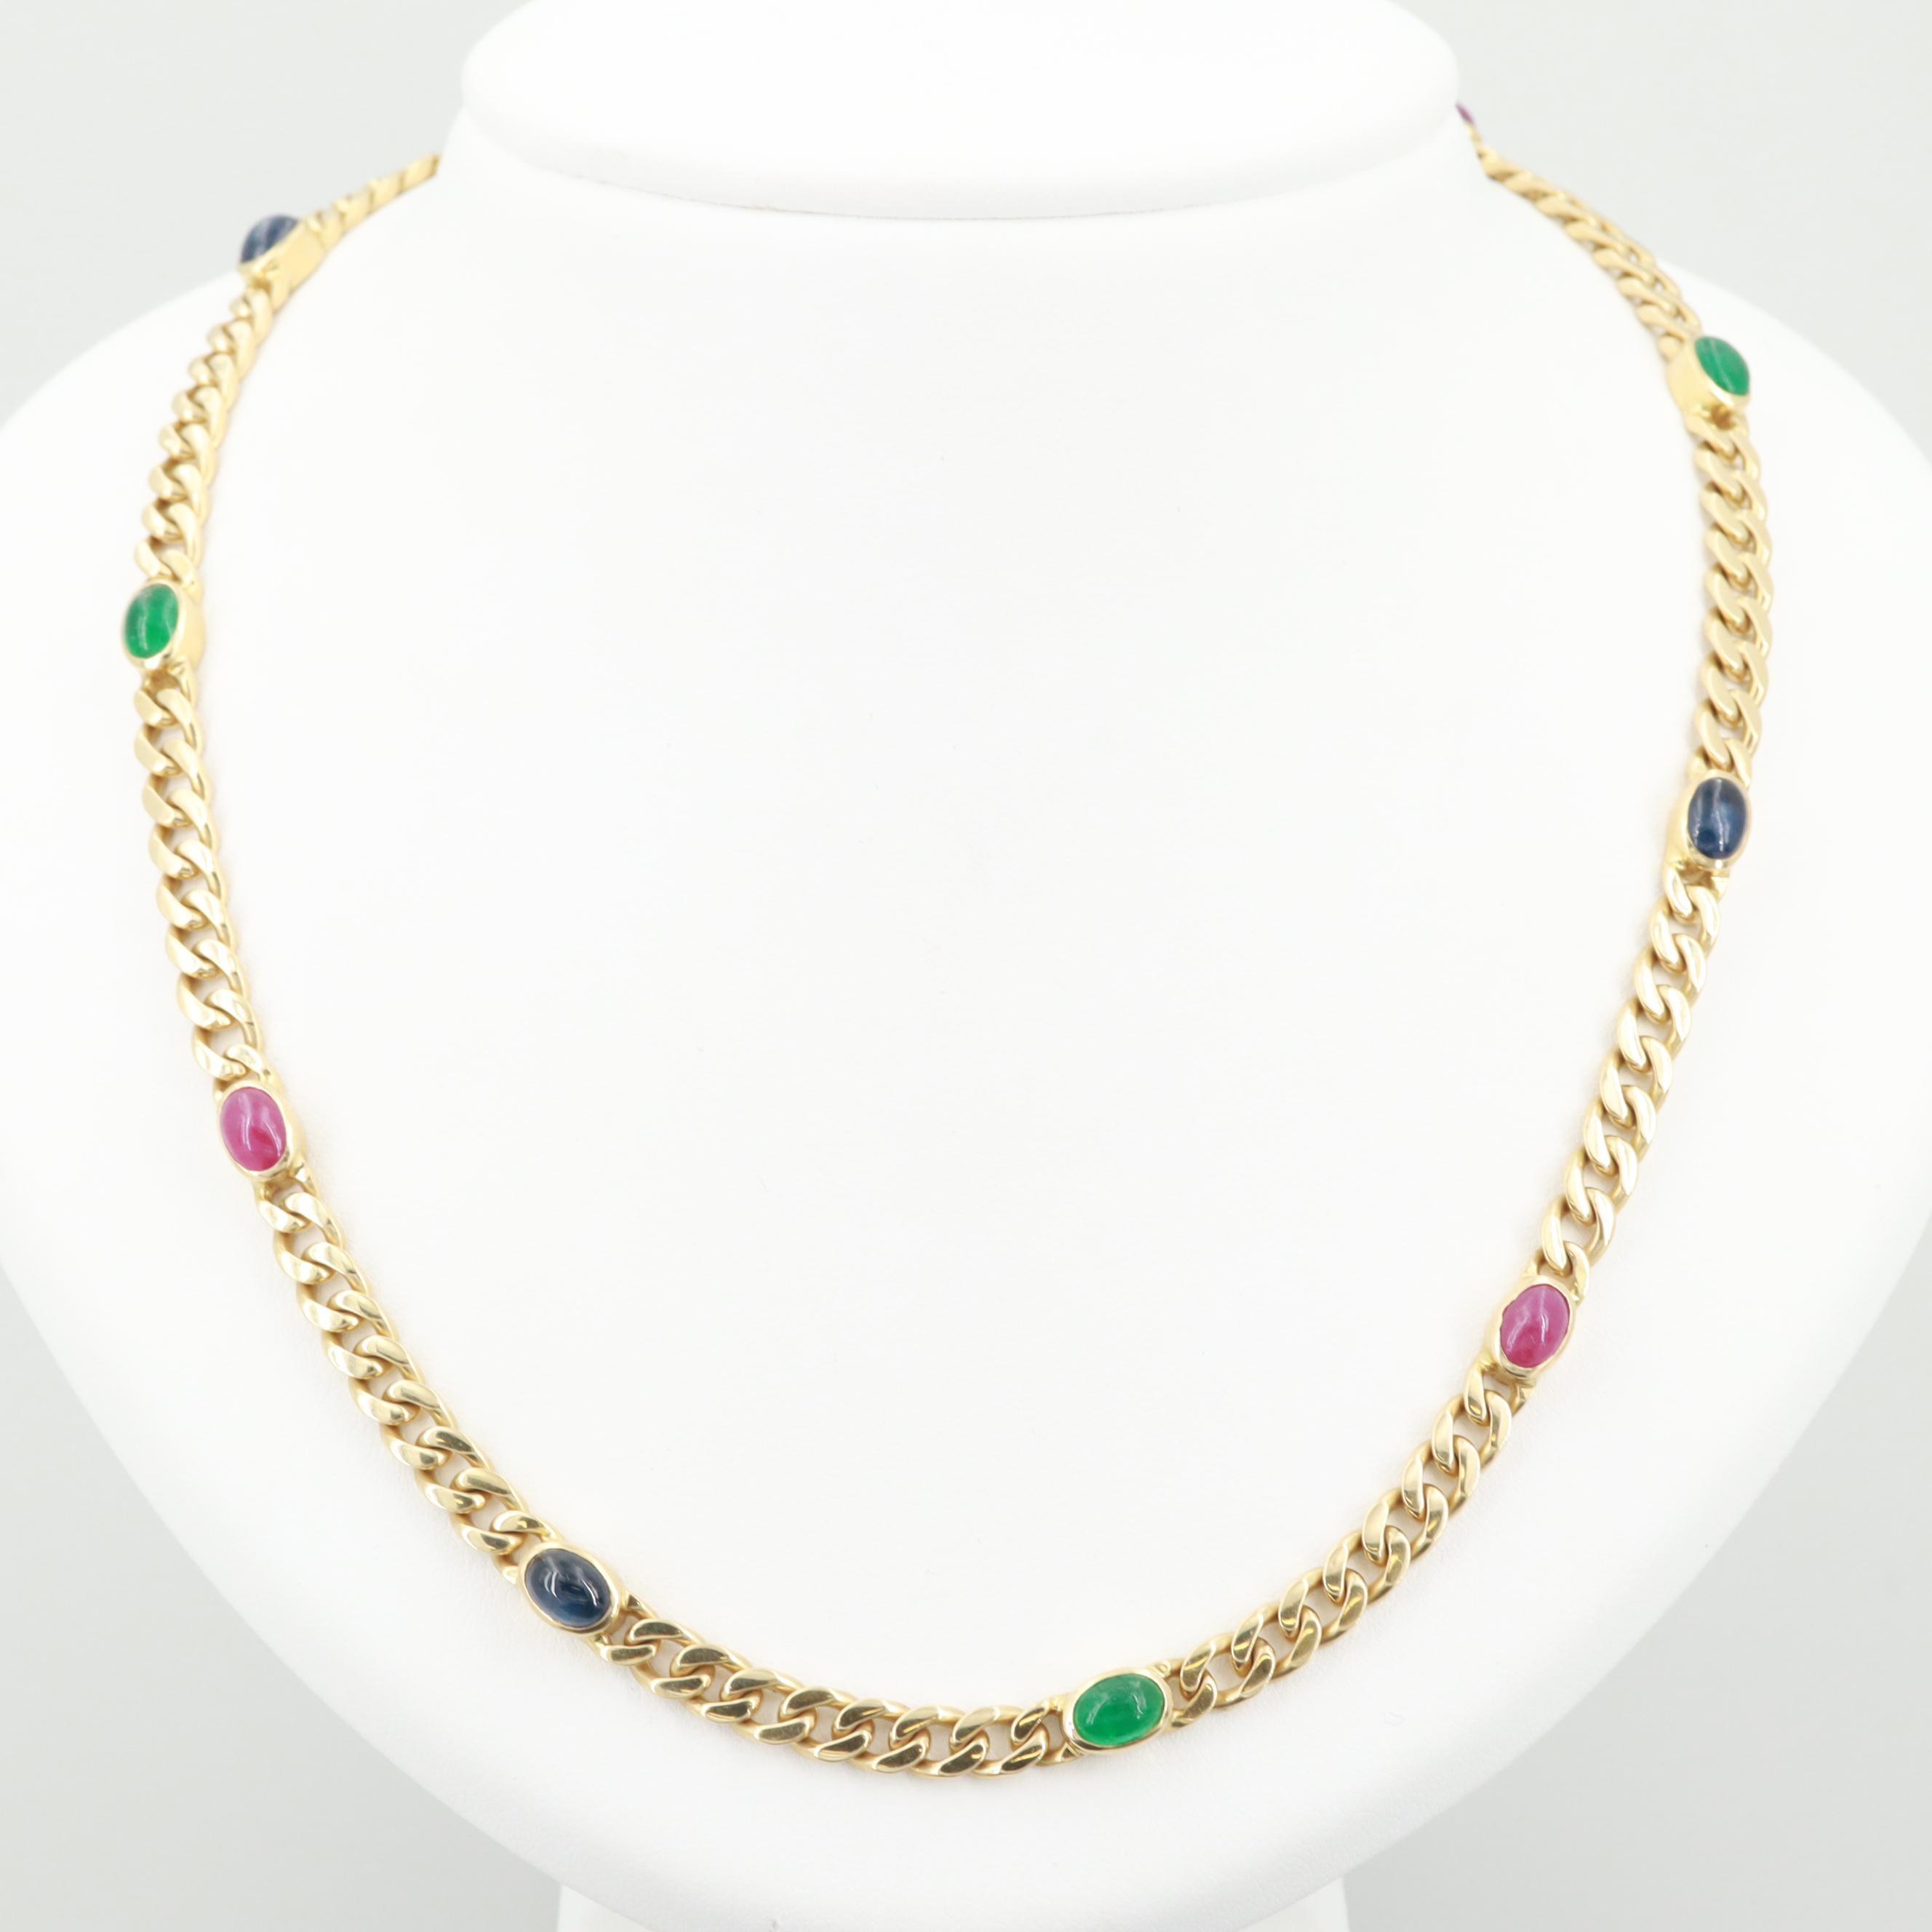 Sinigaglia 18K Yellow Gold Ruby, Emerald and Sapphire Necklace